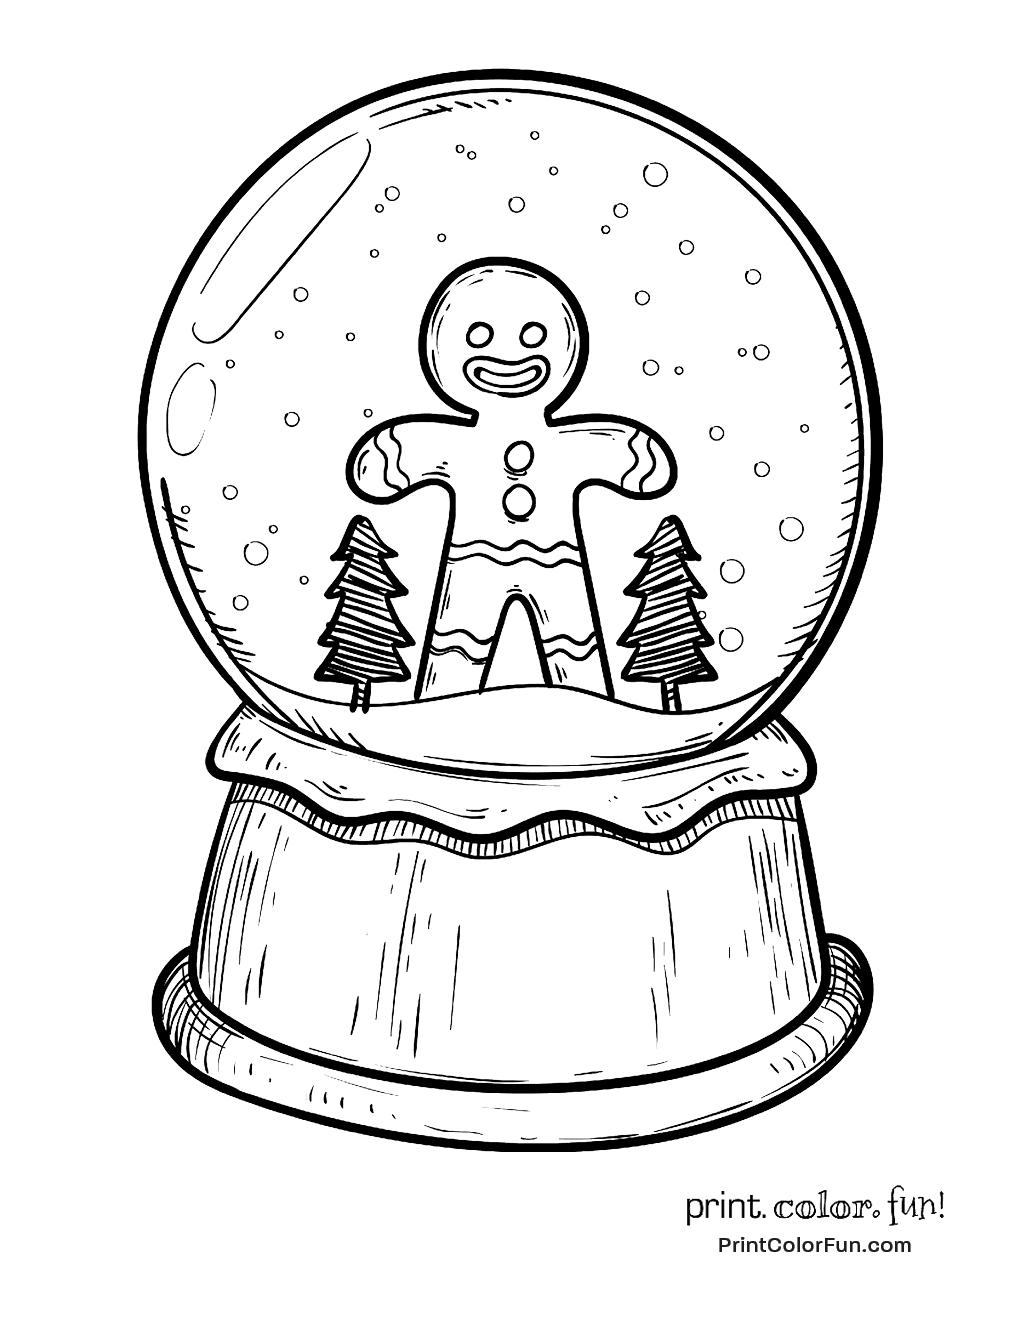 Blank Gingerbread Man Print Color Fun Free Printables Coloring